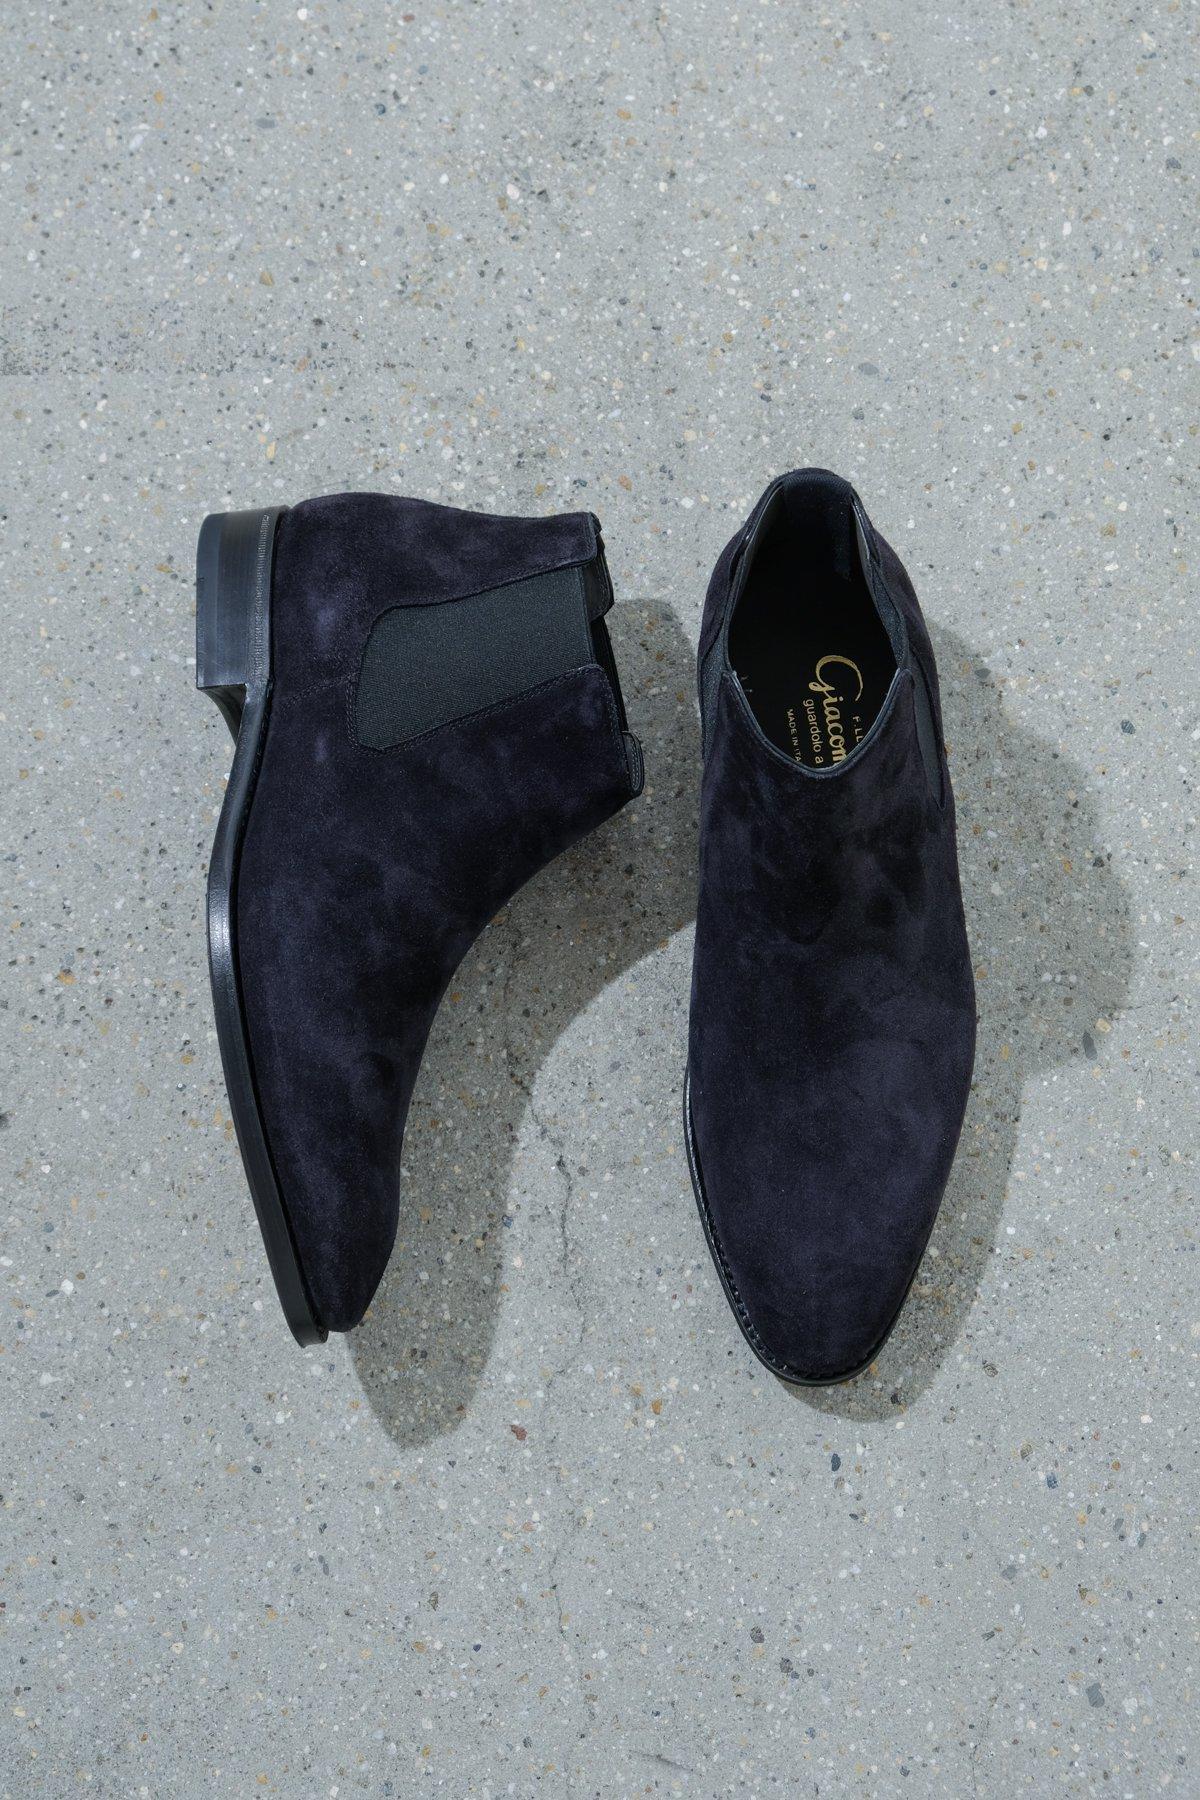 F.lli Giacometti / SIDE GOA BOOTS